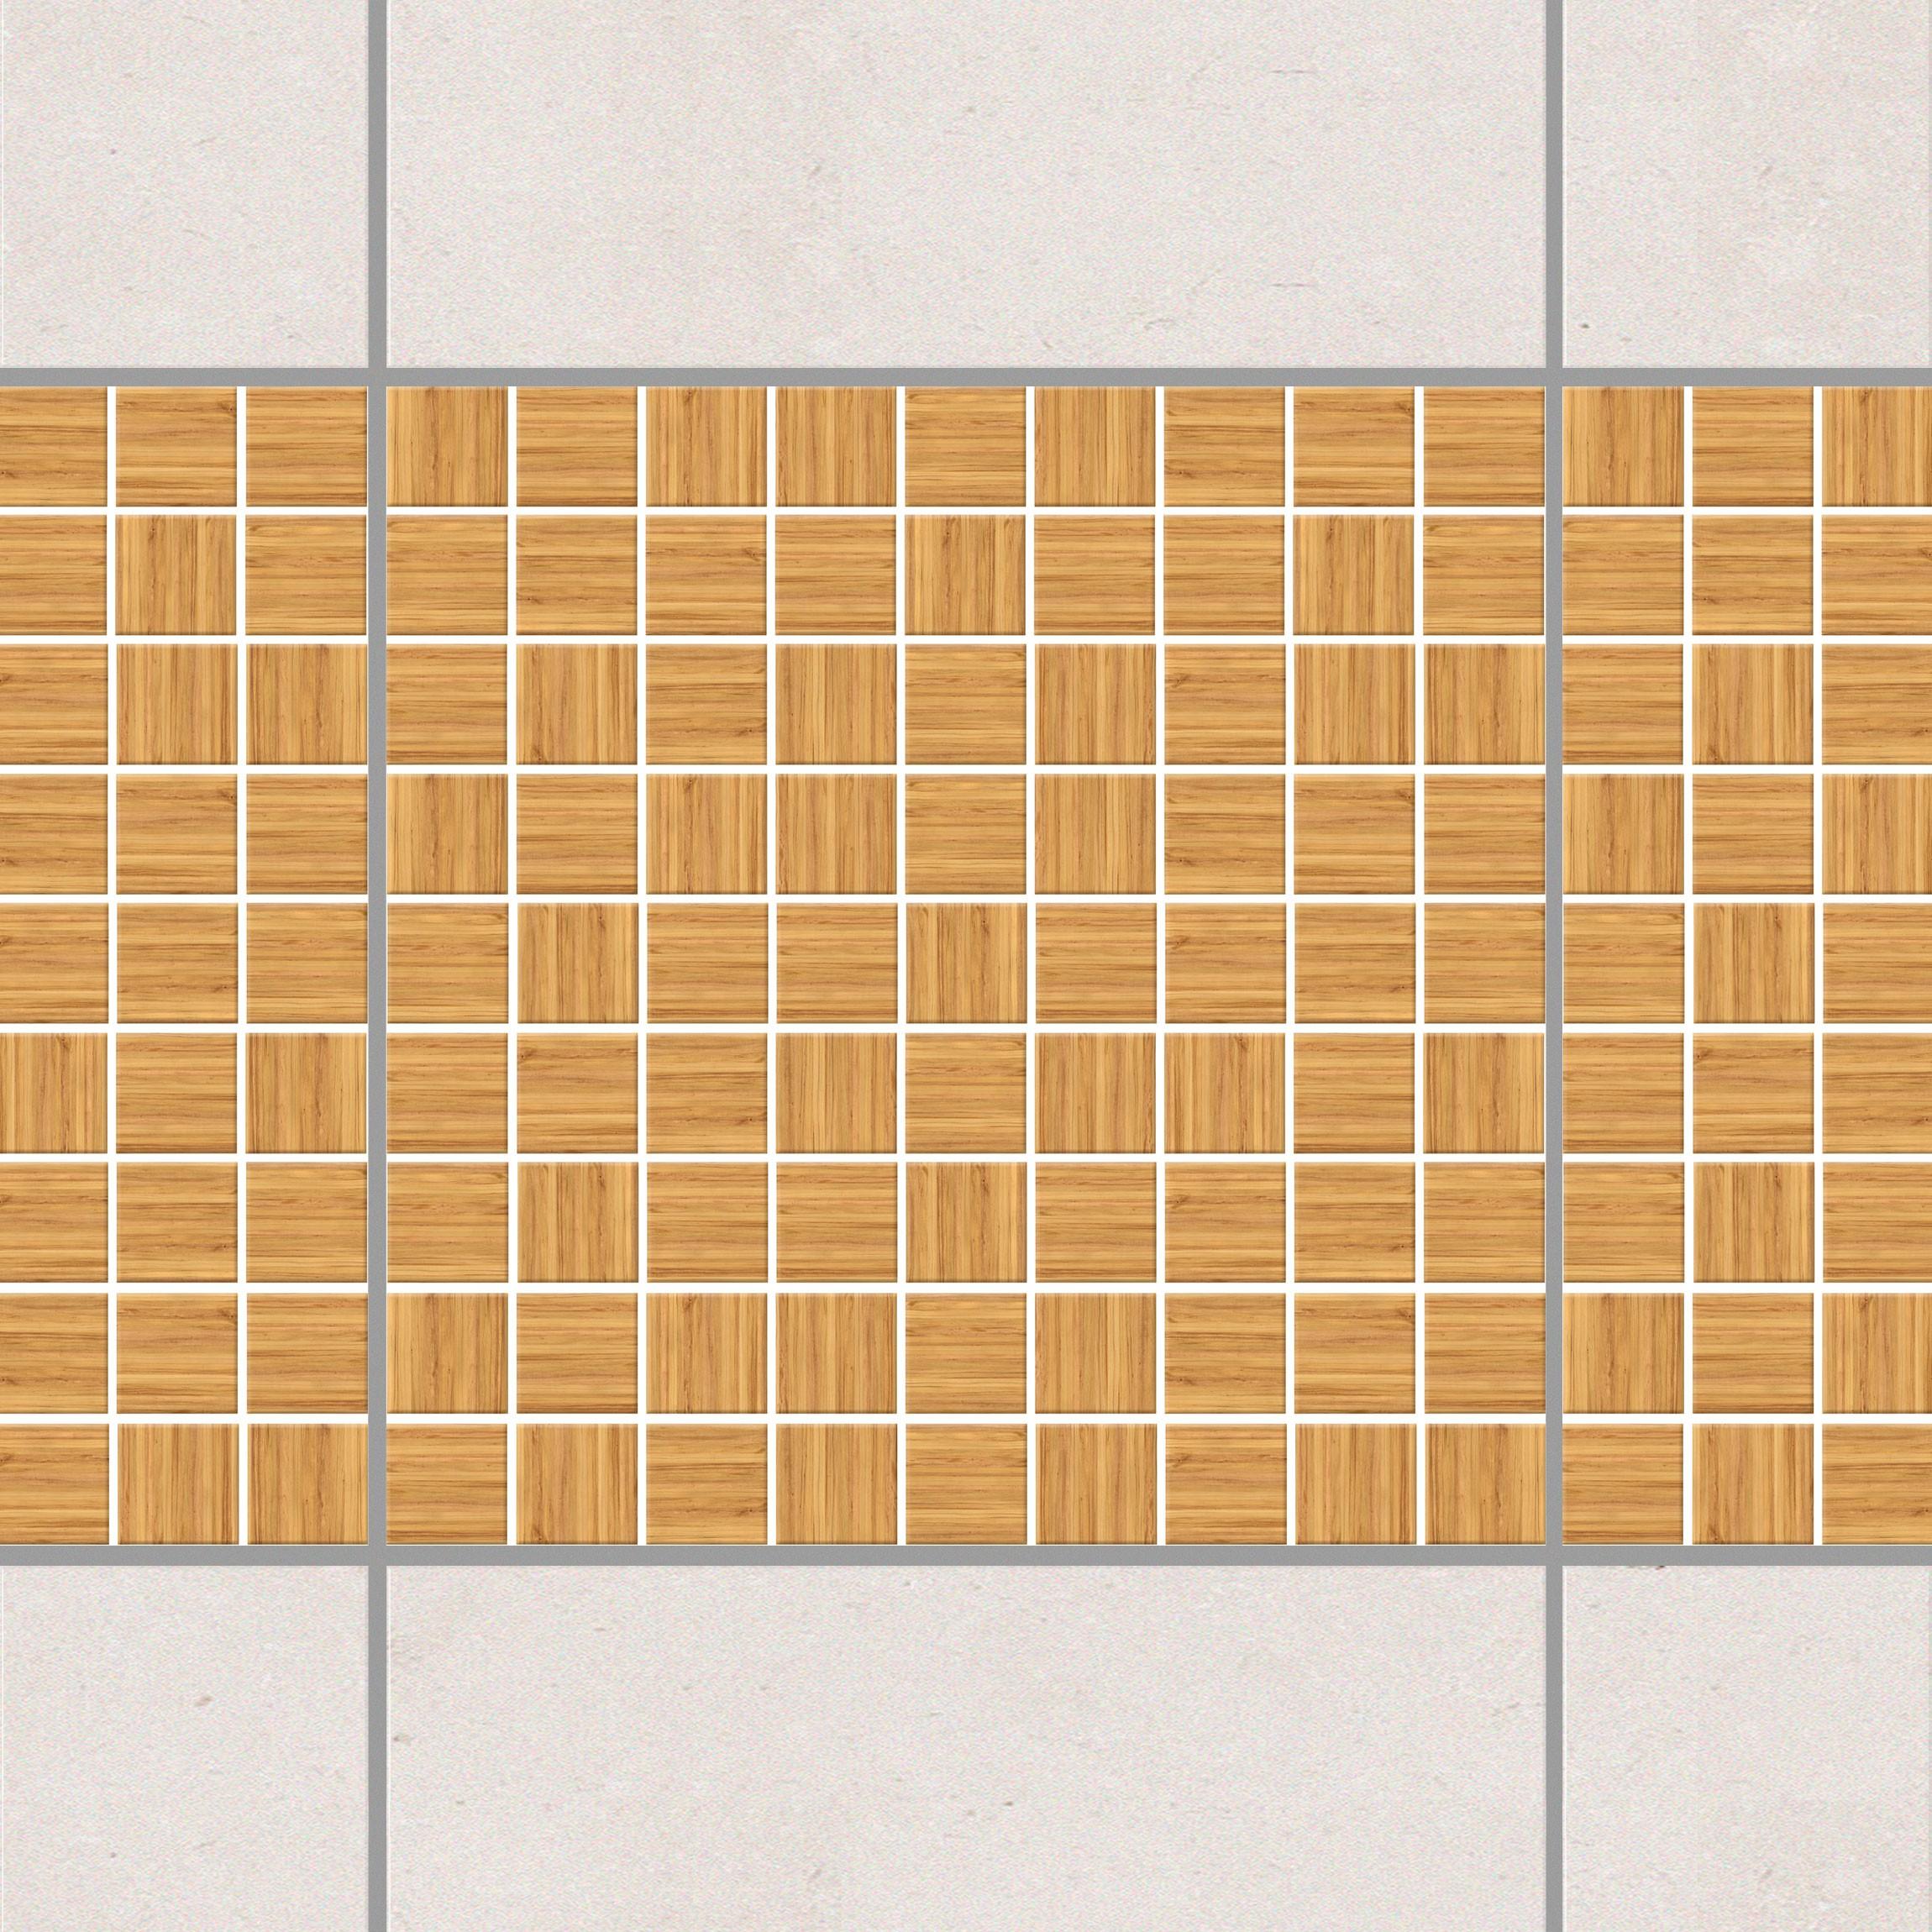 Selbstklebende Mosaikfliesen: Selbstklebende Mosaikfliesen Holzoptik